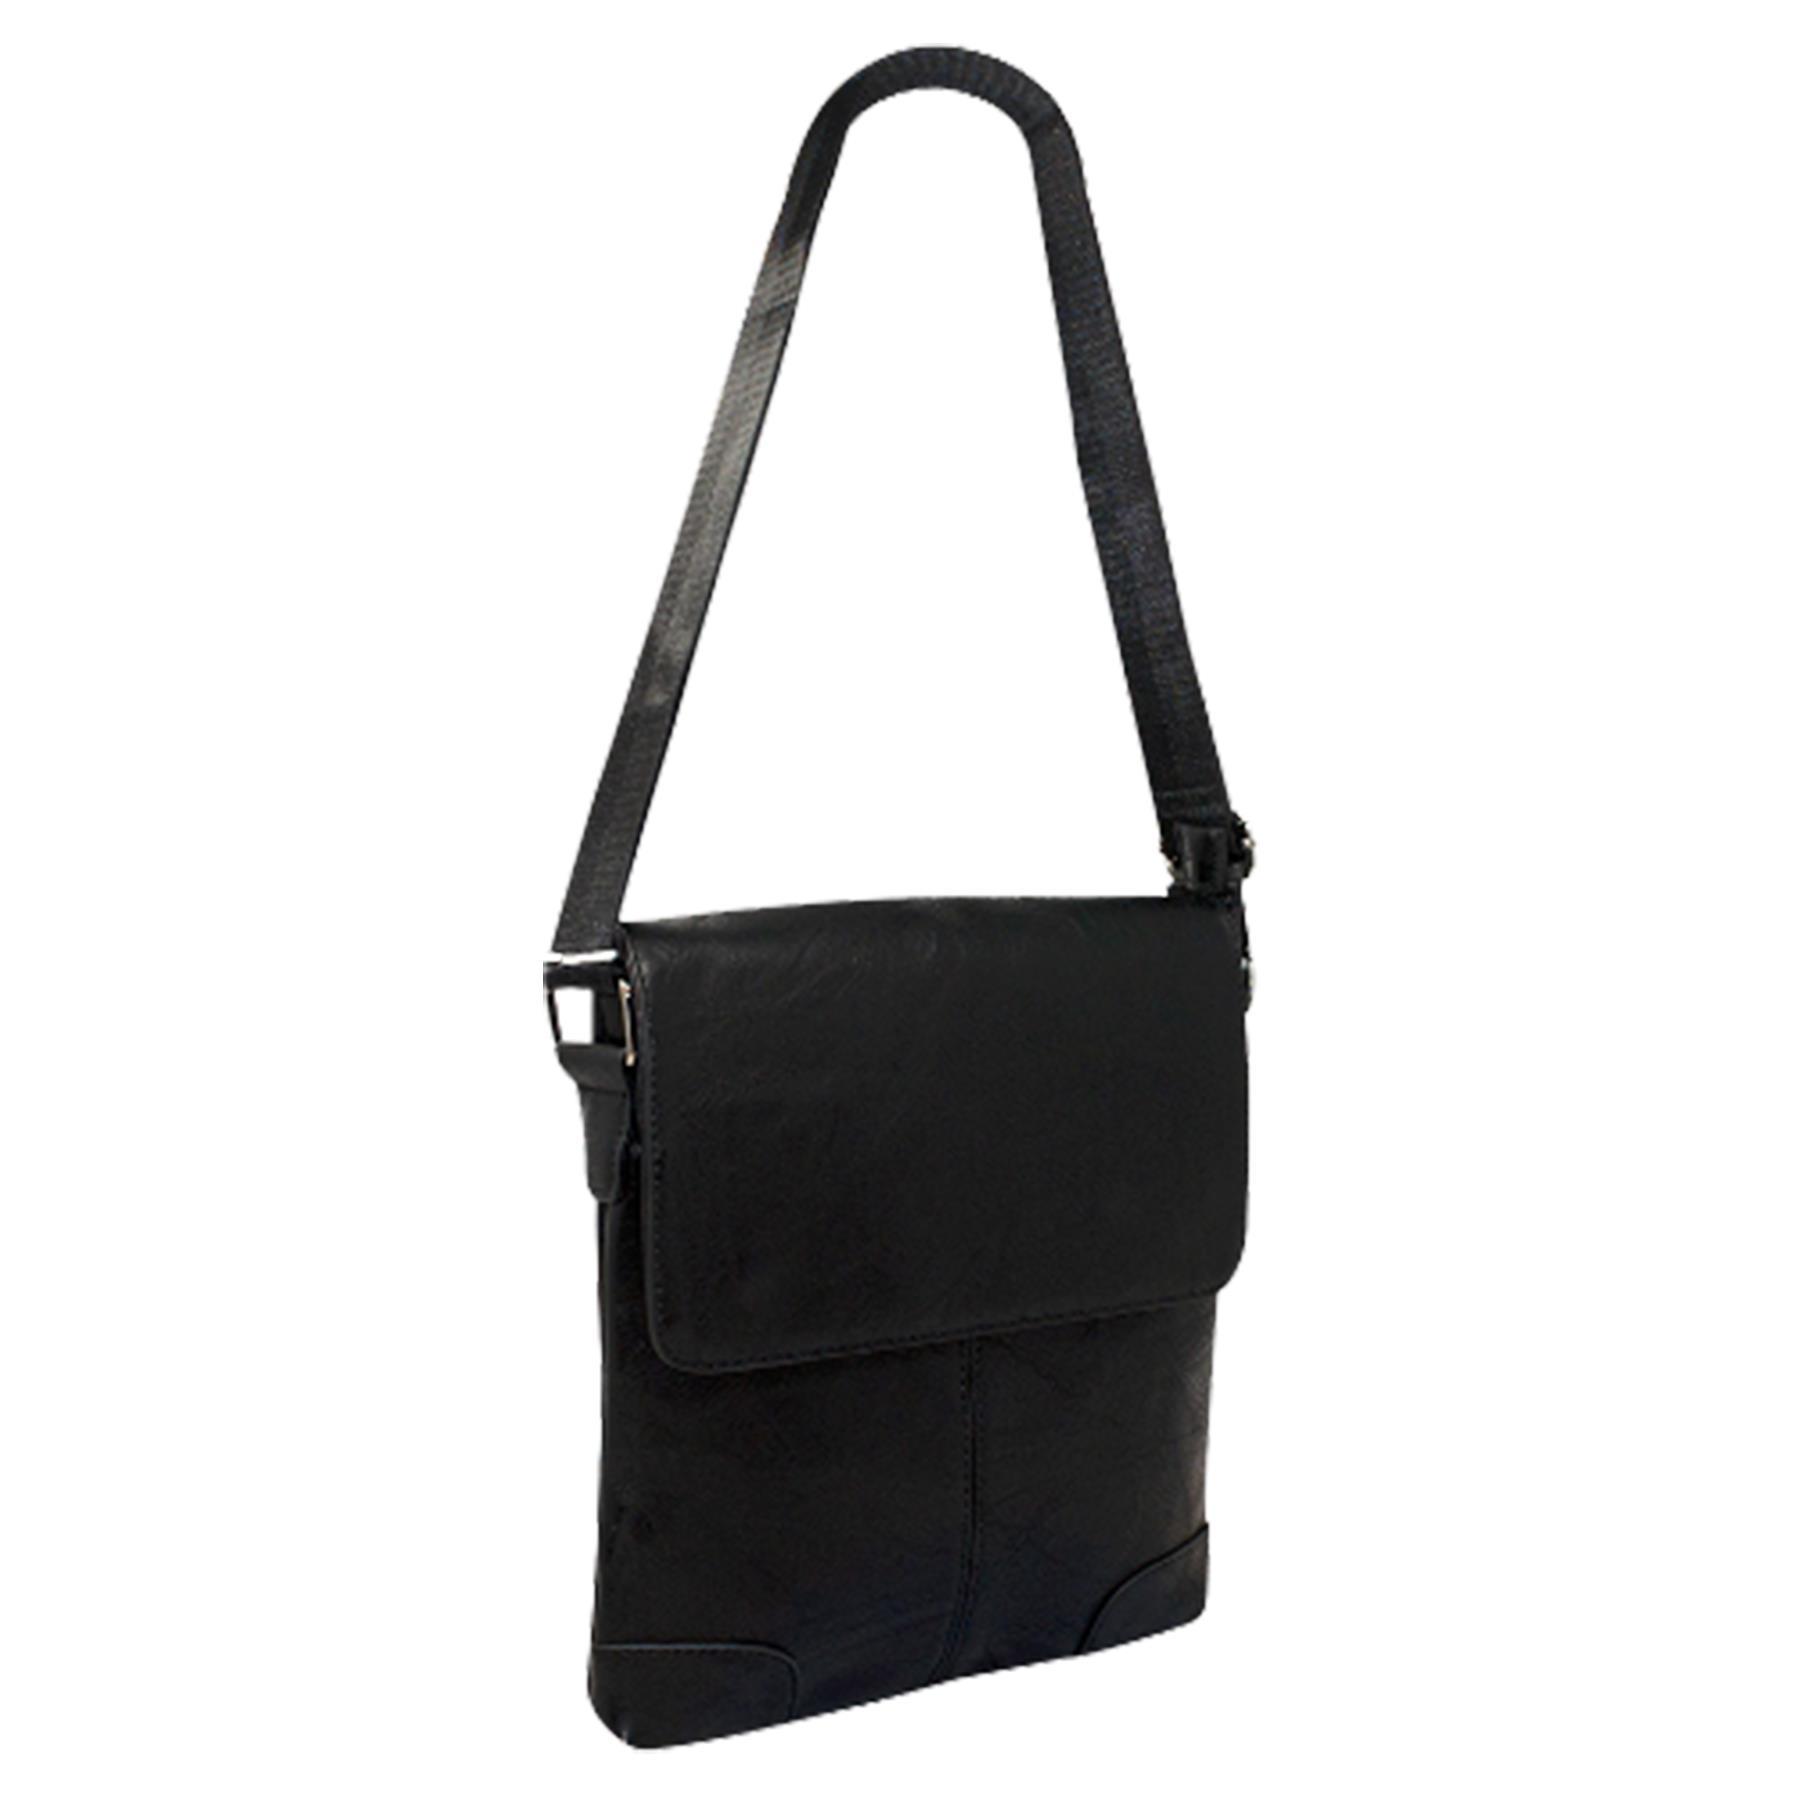 New-Plain-Faux-Leather-Men-s-Travel-Casual-Flap-Over-Messenger-Bag thumbnail 3